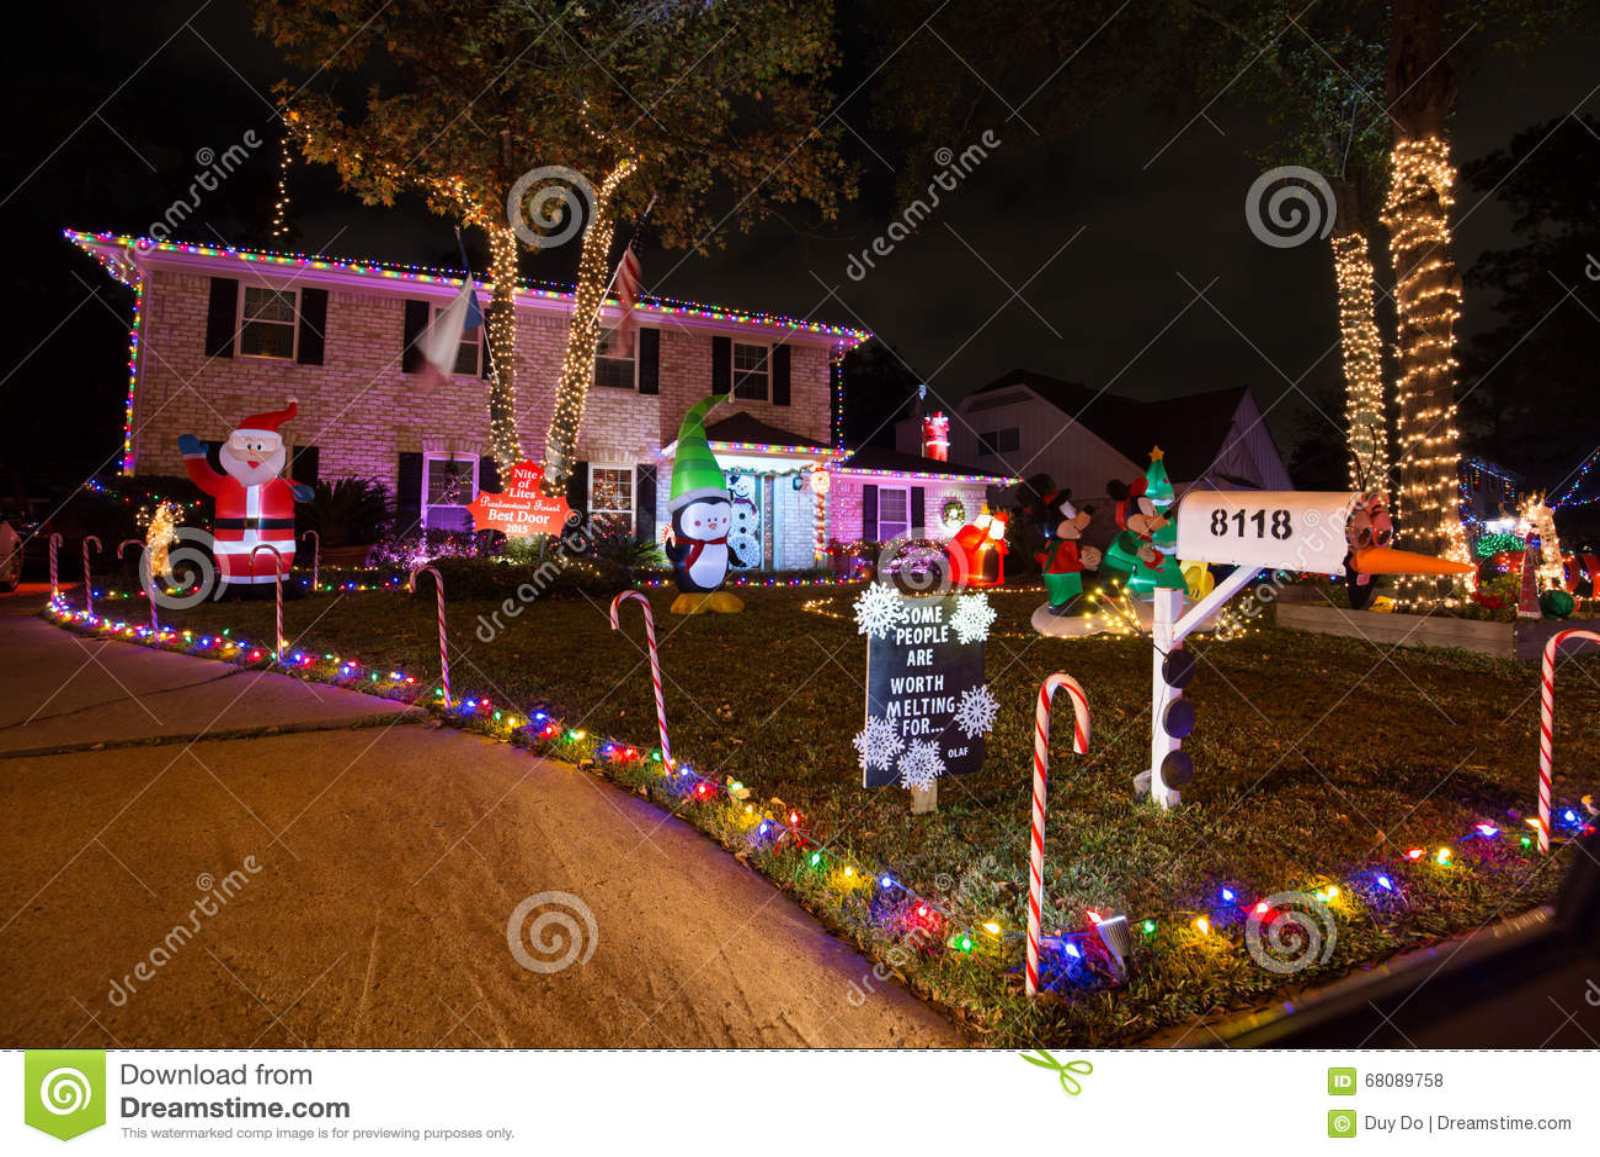 united states houston on 11 december 2015 beautiful christmas light in houston texas - Christmas In Houston 2015